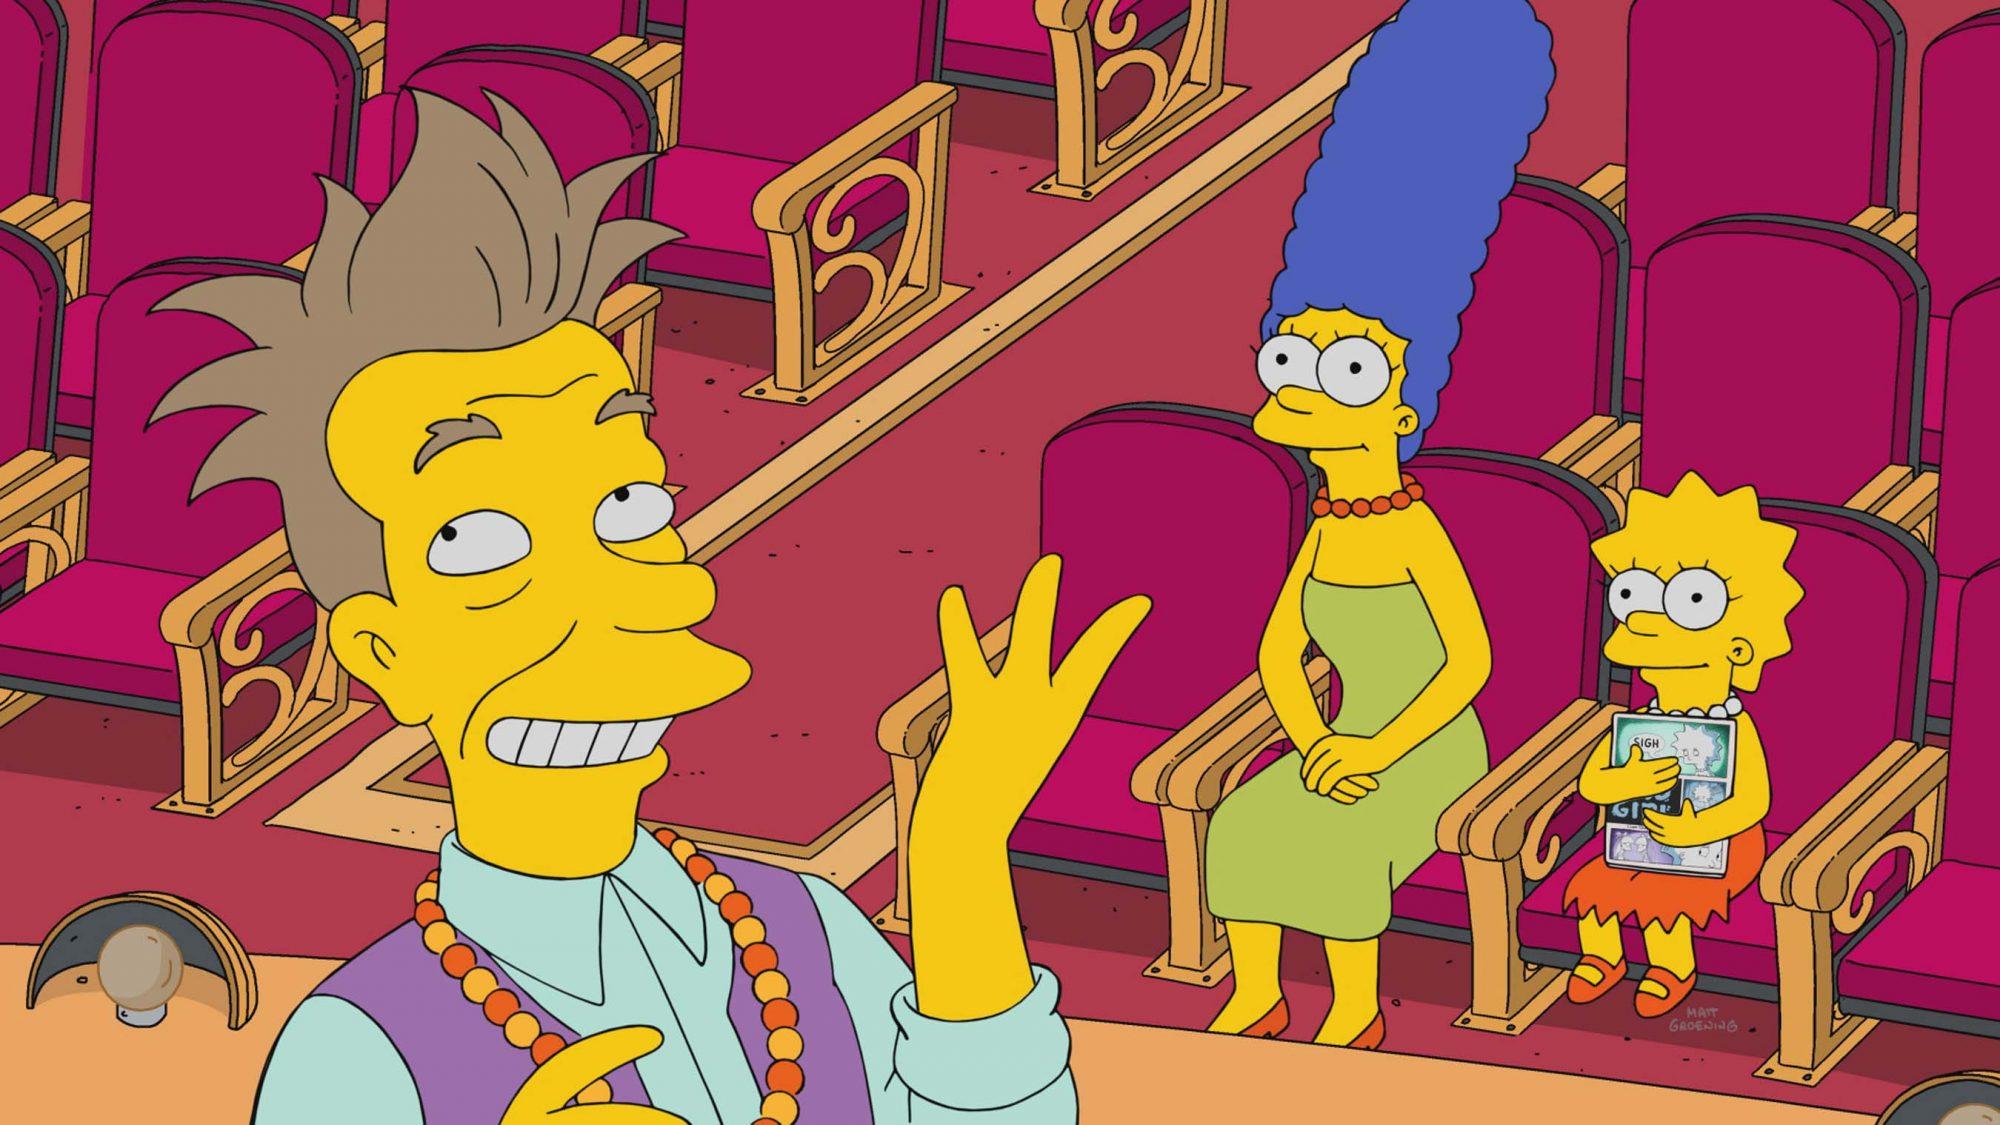 Simpsons_2822_SpringfieldSplendor_Sc_3013_Avid_Color_Corrected